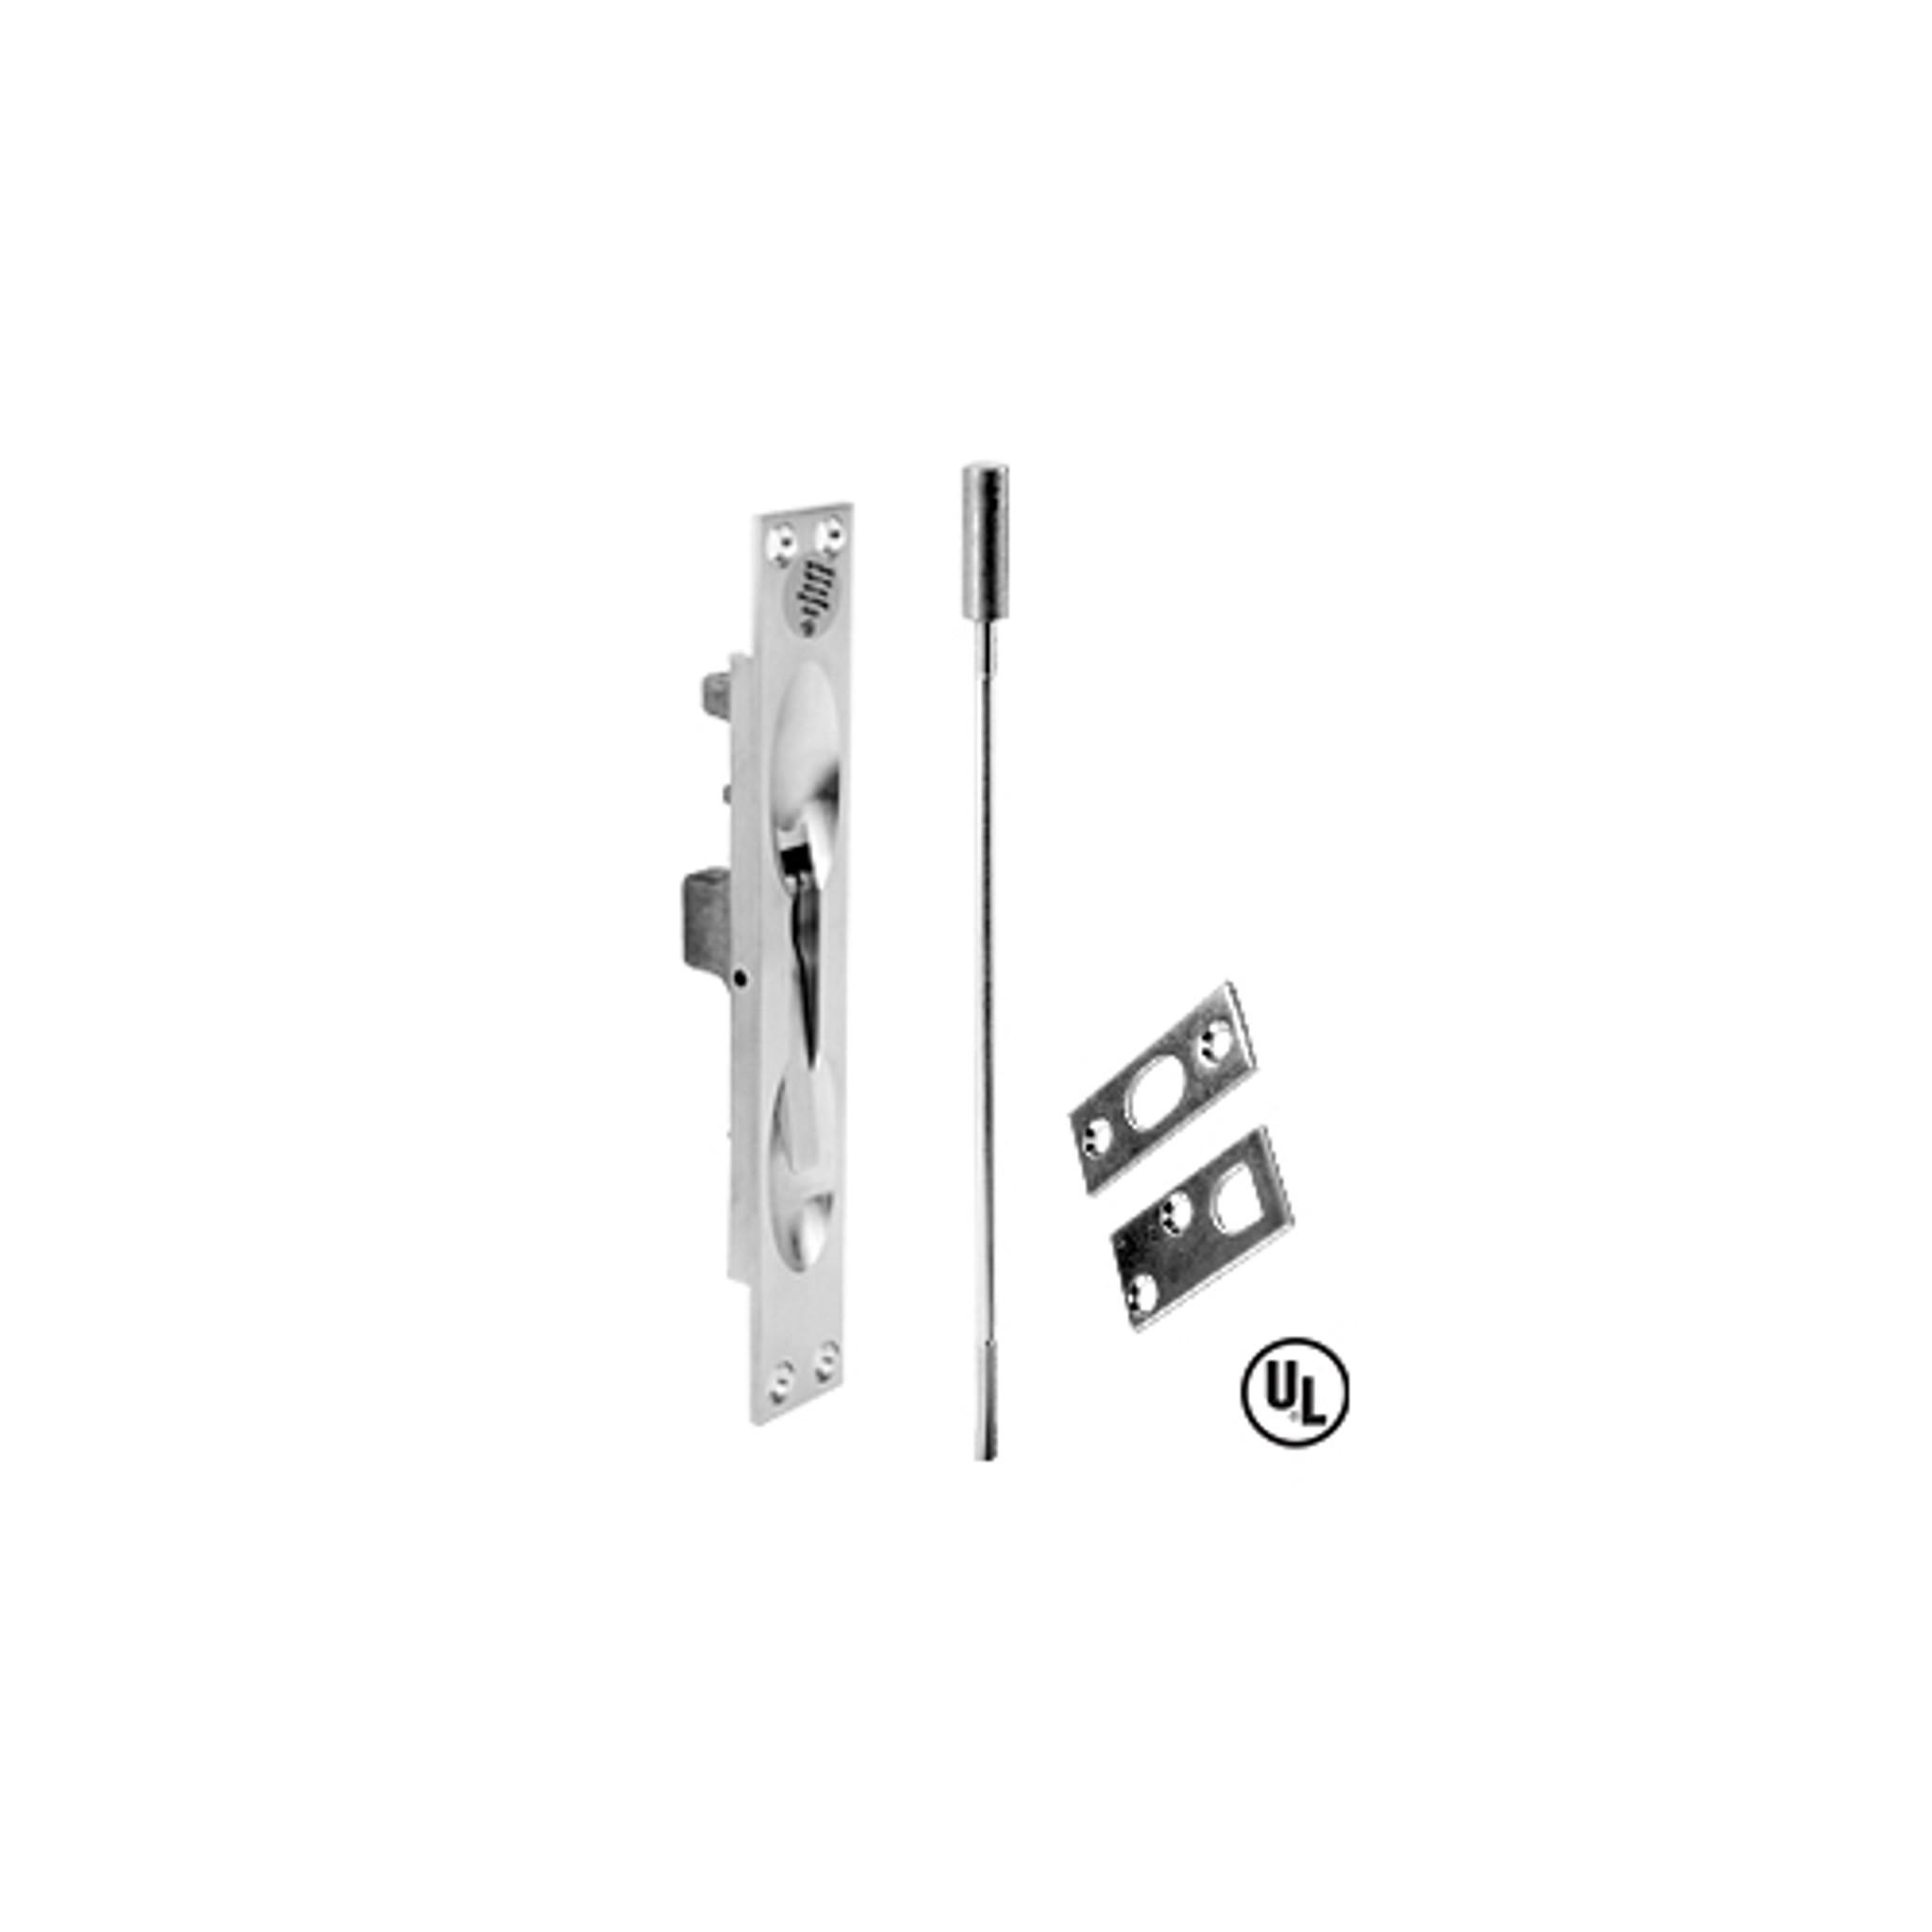 Don Jo 1555 626 Metal Doors Flush Bolt